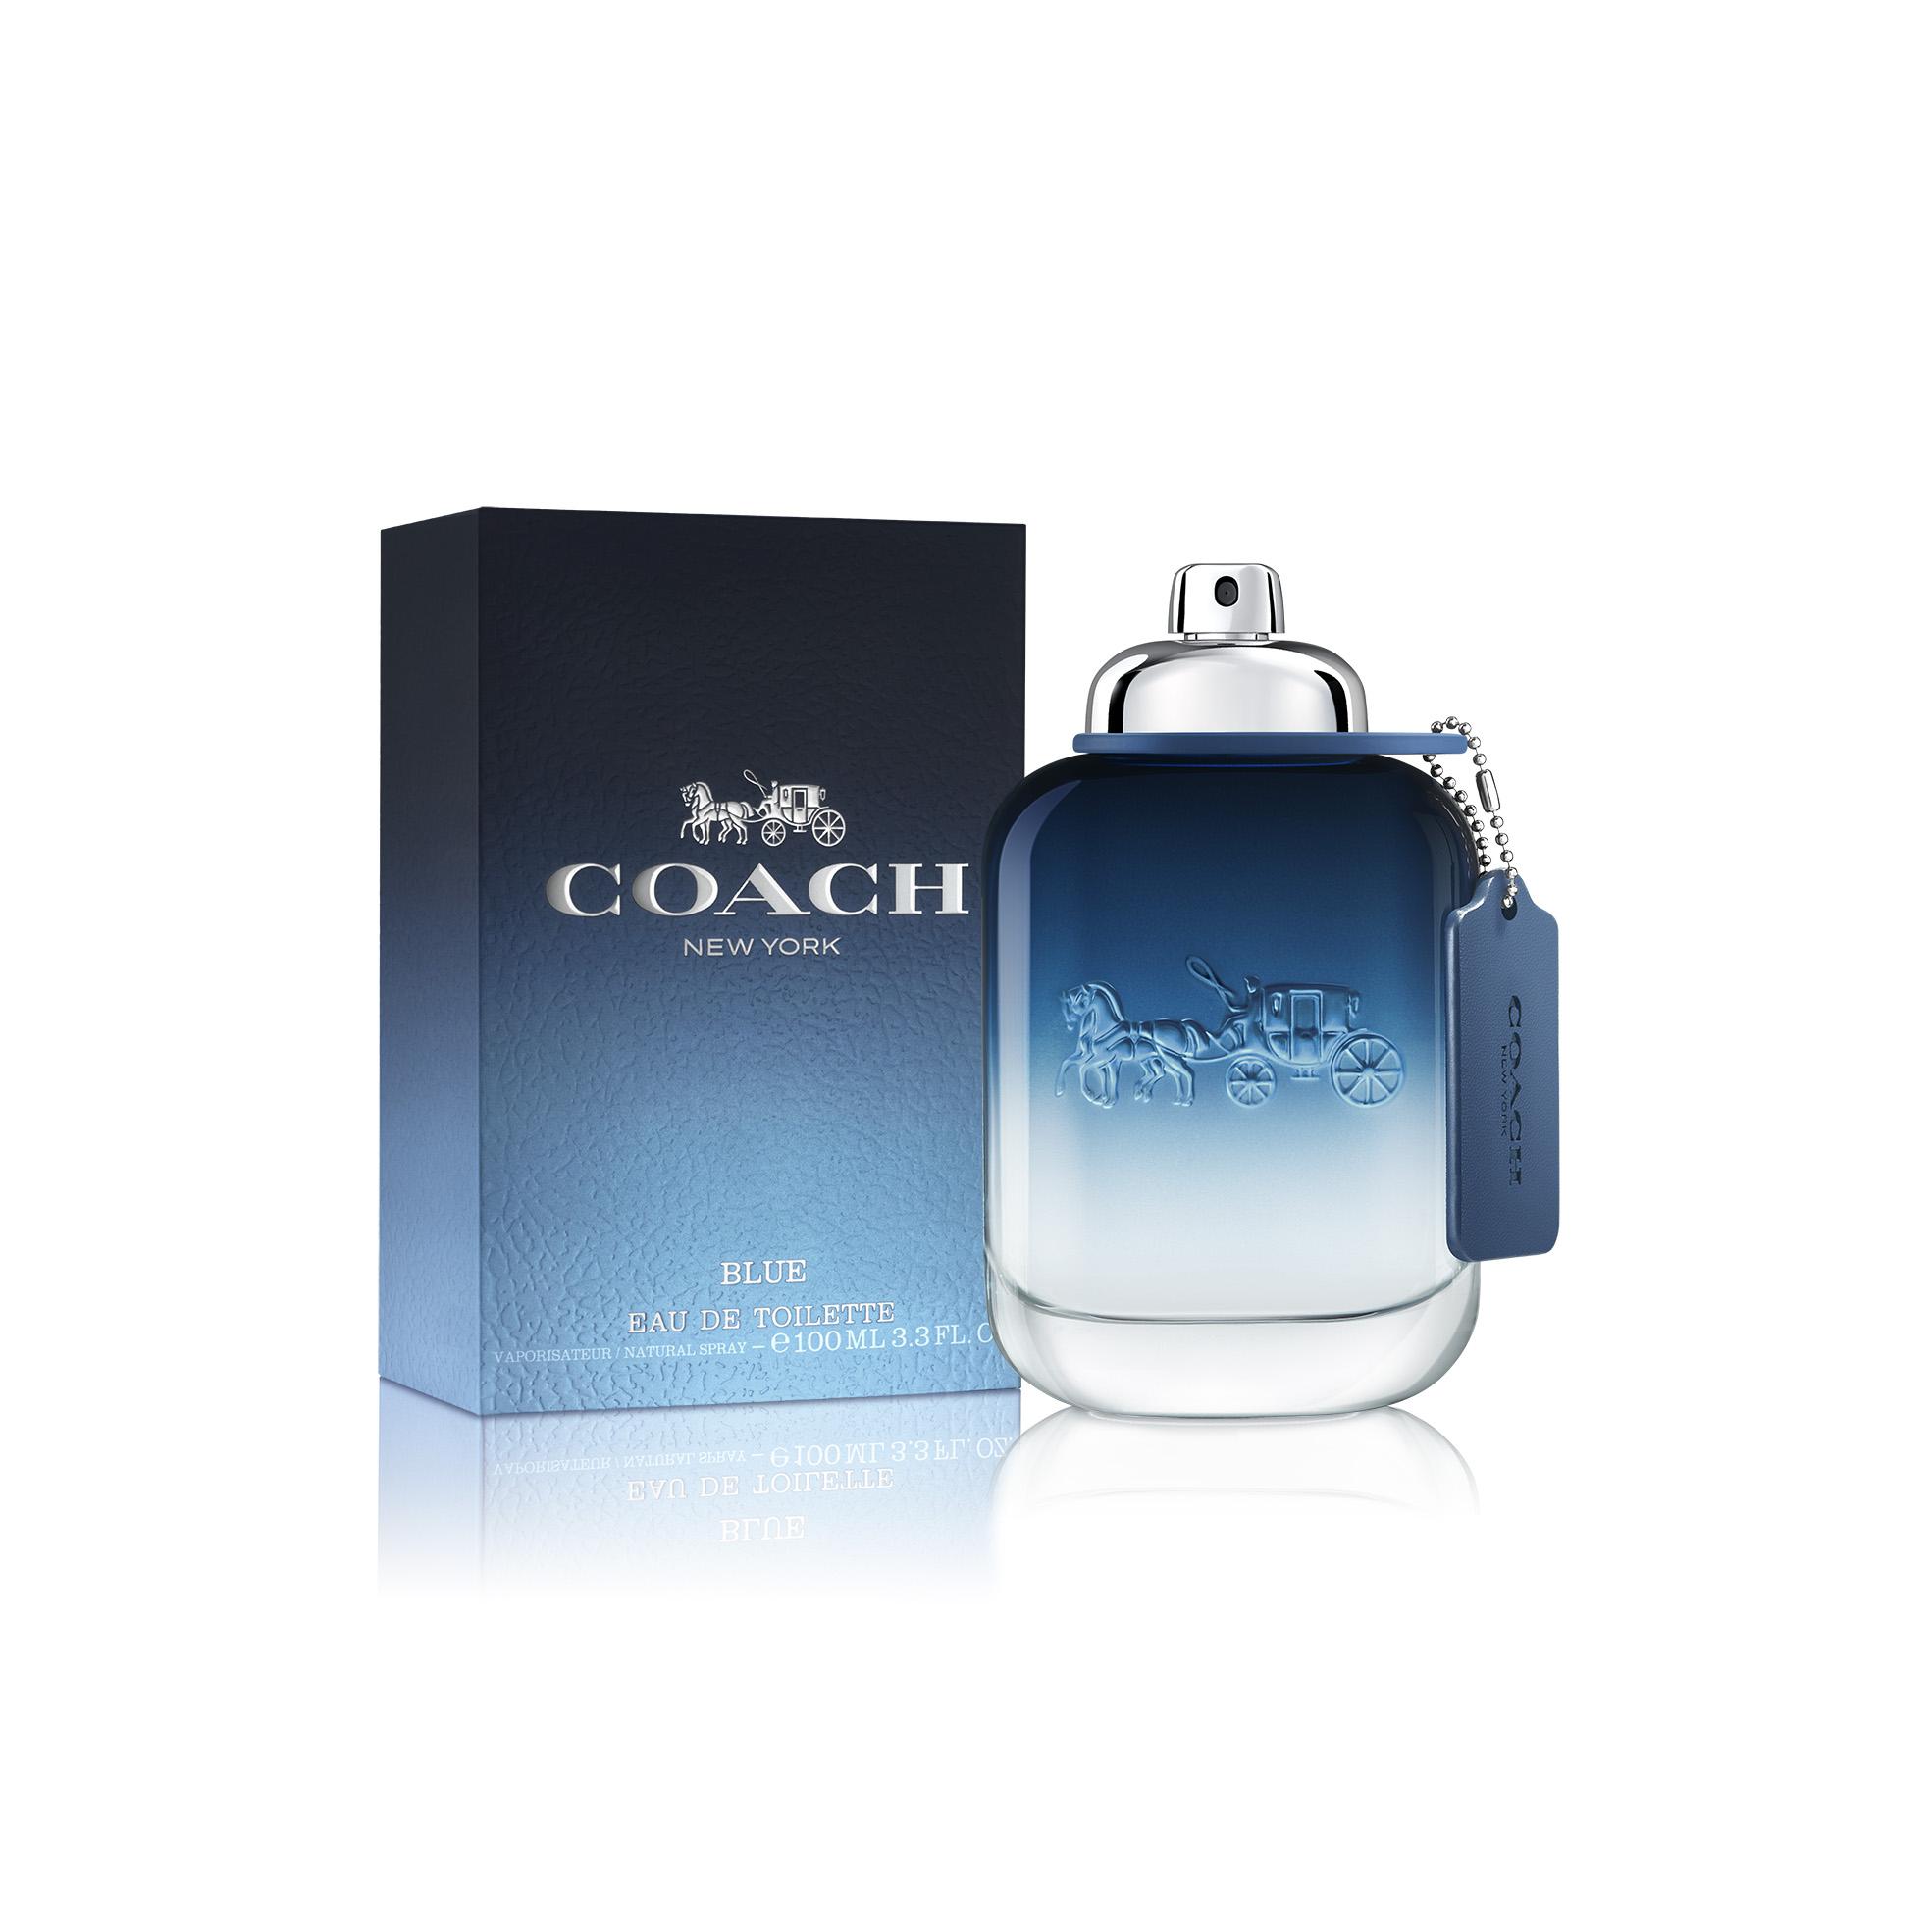 Coach Blue profumo uomo